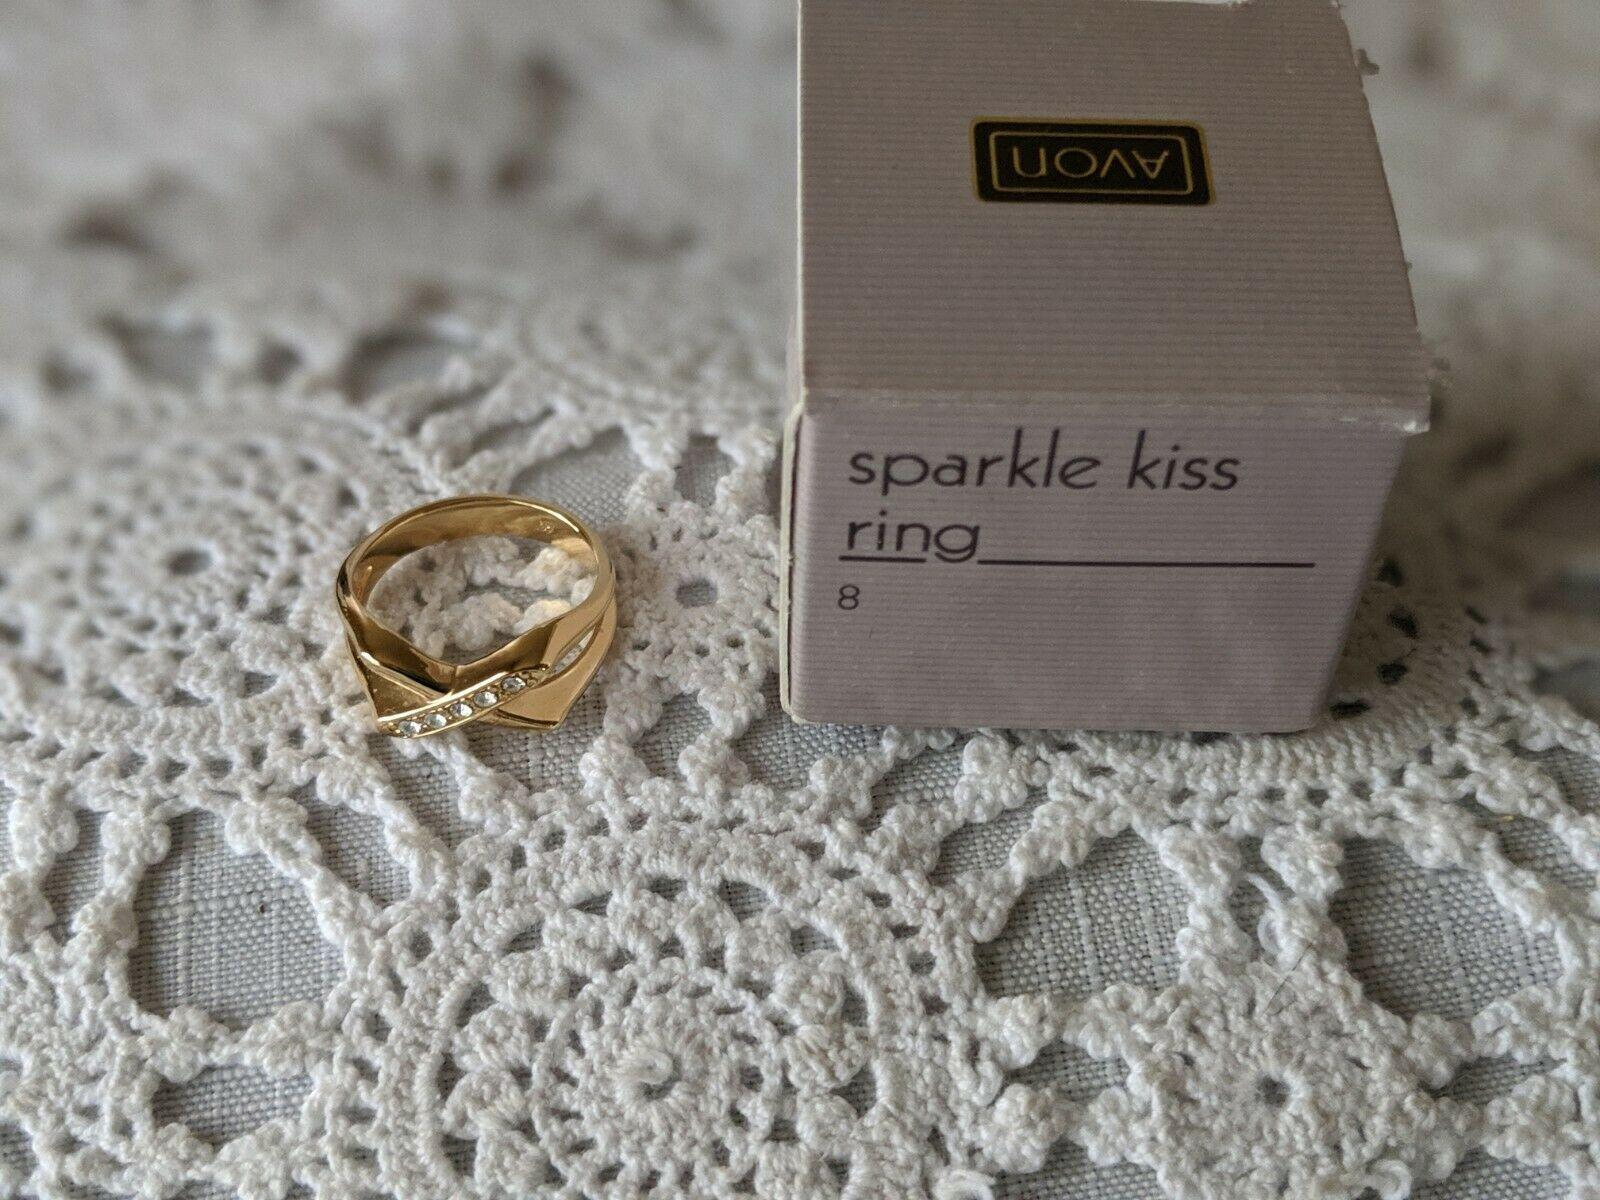 Avon Designer Signed Sparkle Kiss Rhinestone Ring Size 8